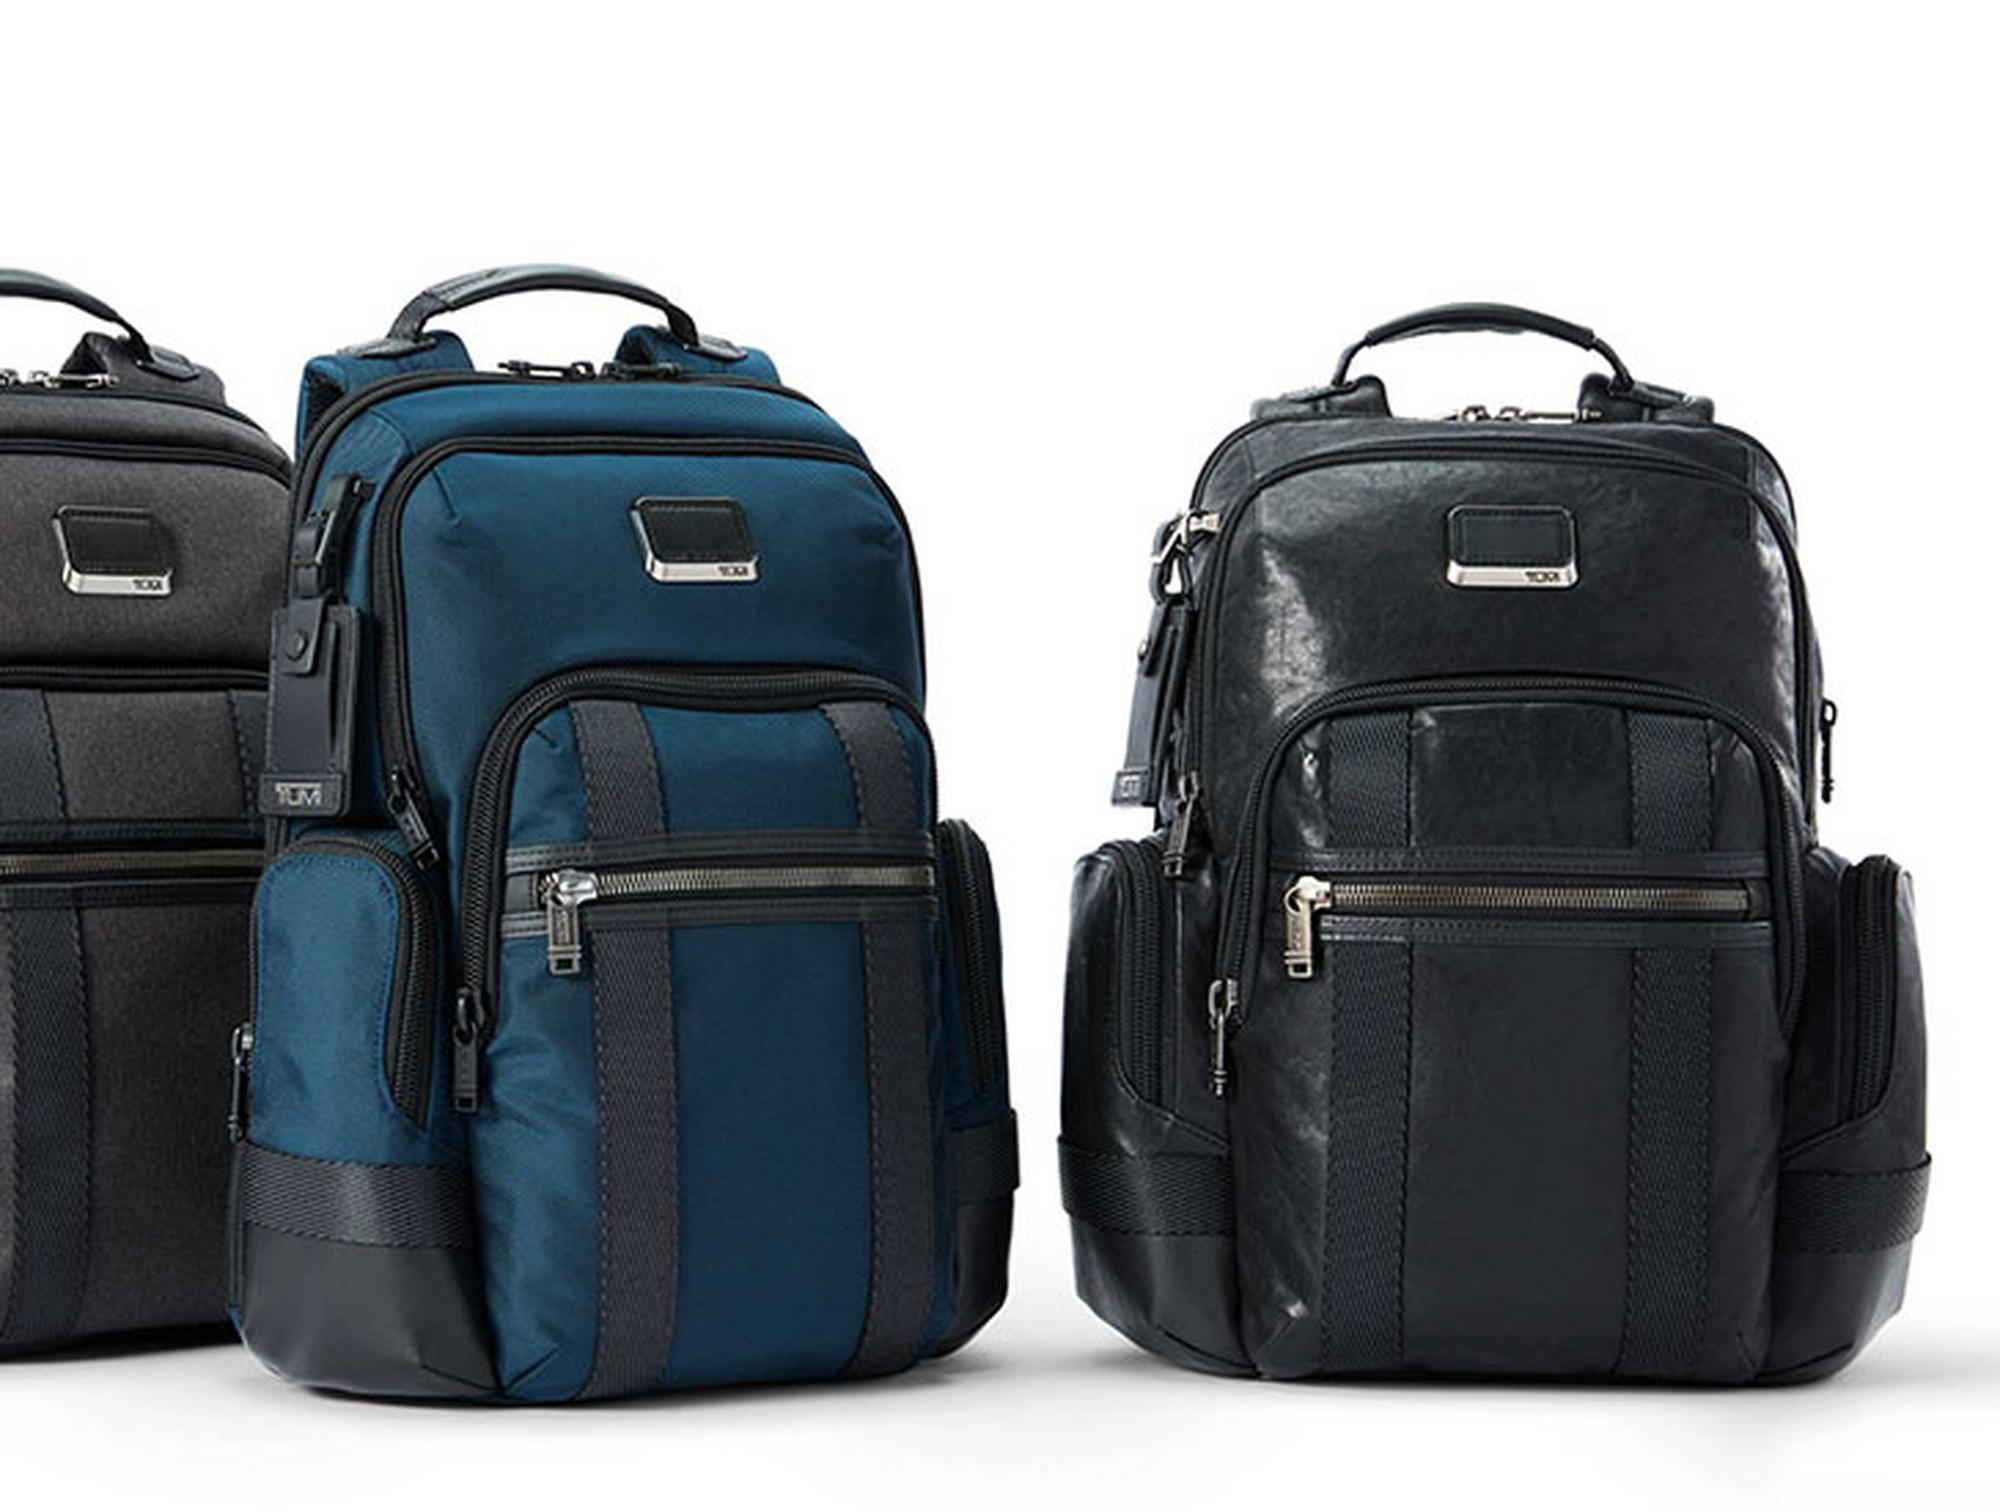 8413cf7bd7e55 Luggage, Backpacks, Bags & More - TUMI US